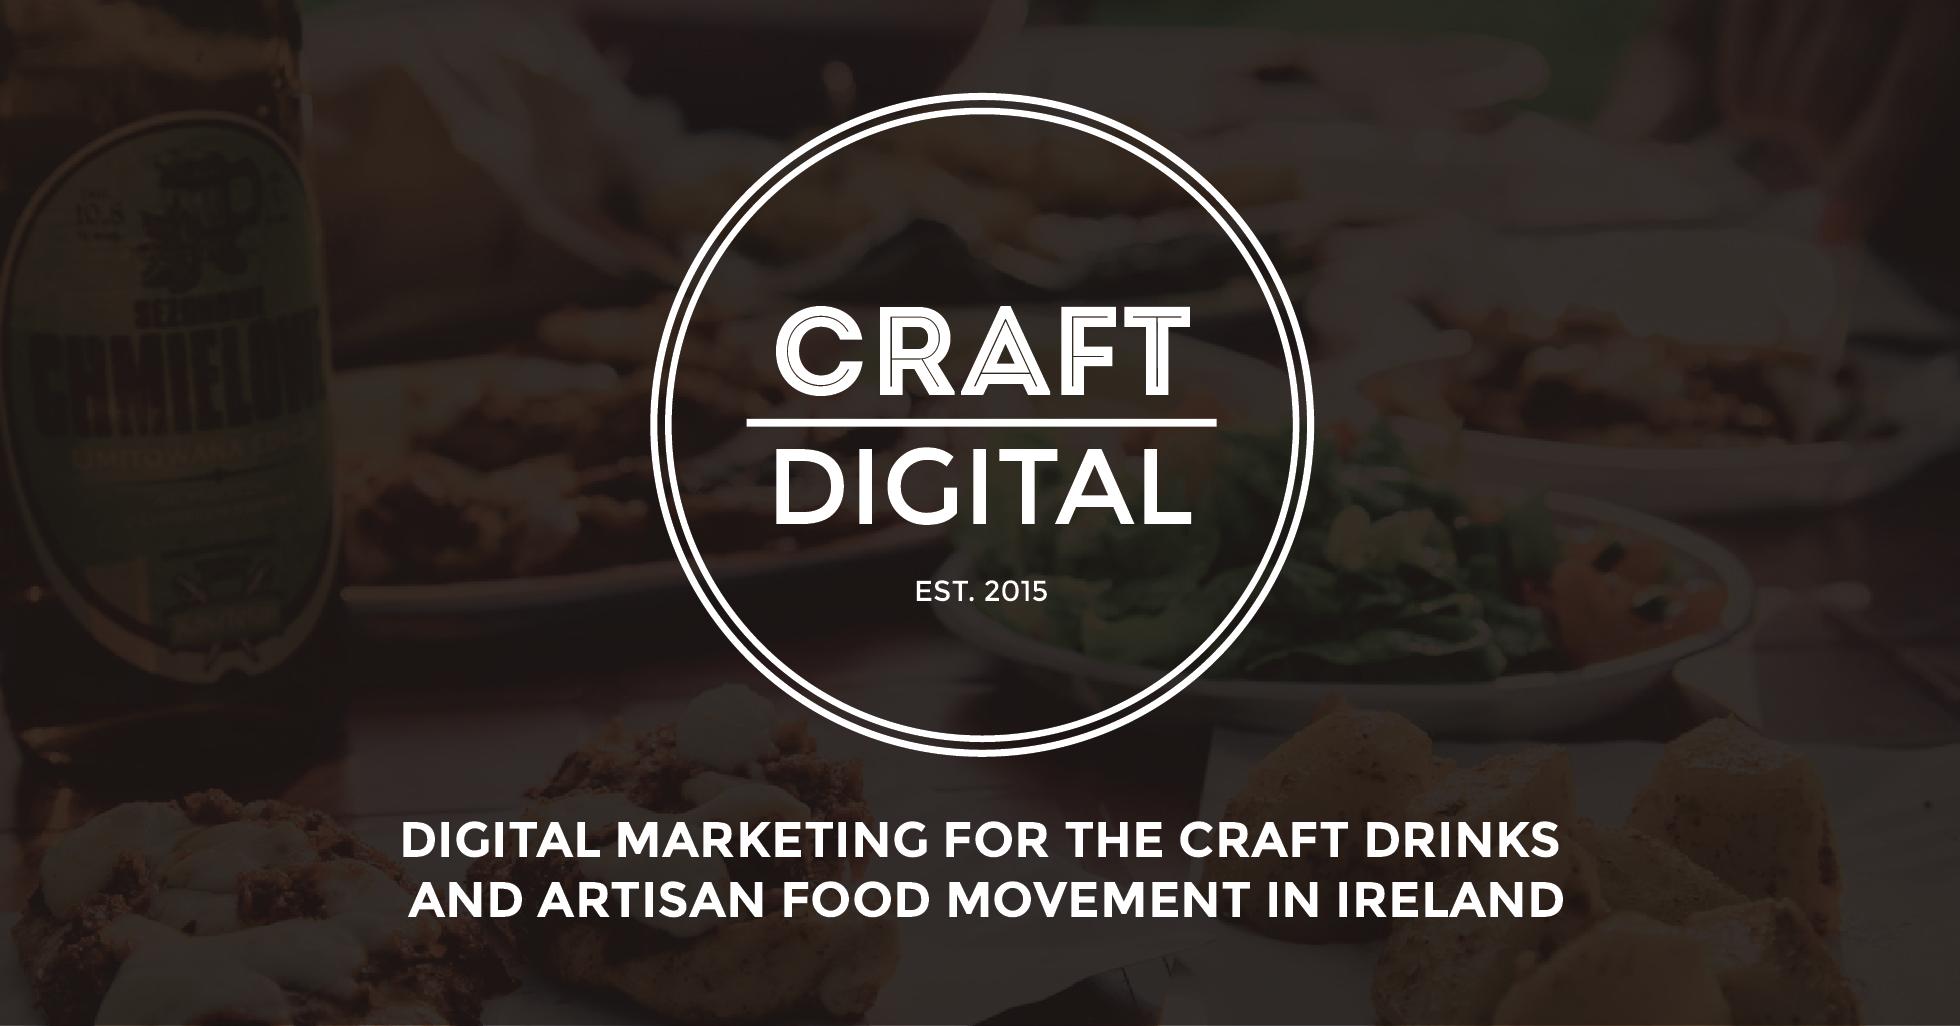 Craft Digital Digital Marketing For Craft Drinks Artisan Food